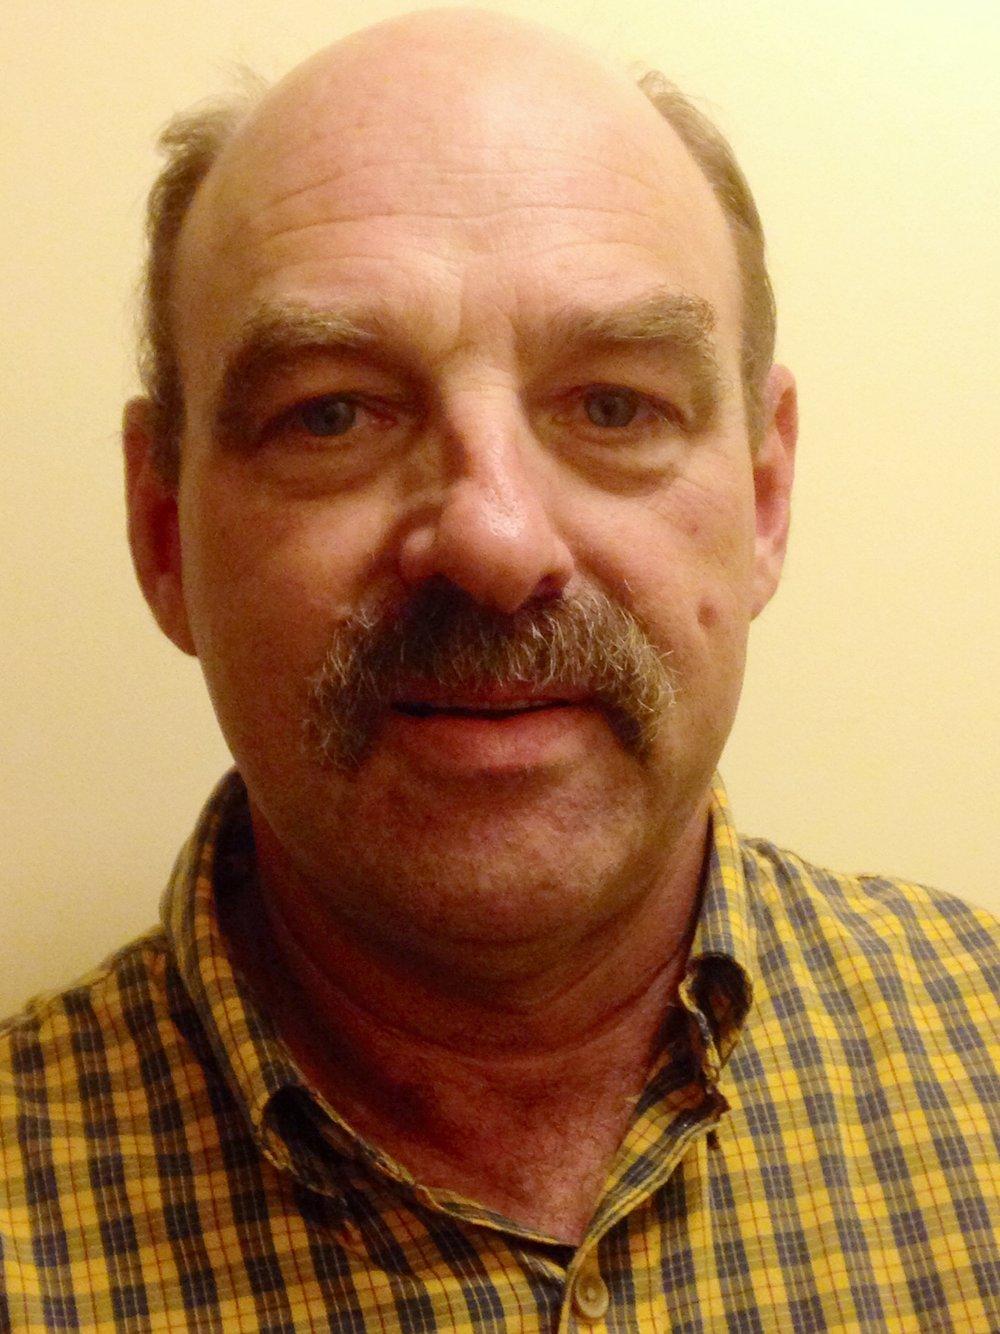 Tom Burkett headshot - Thomas Burkett.JPG